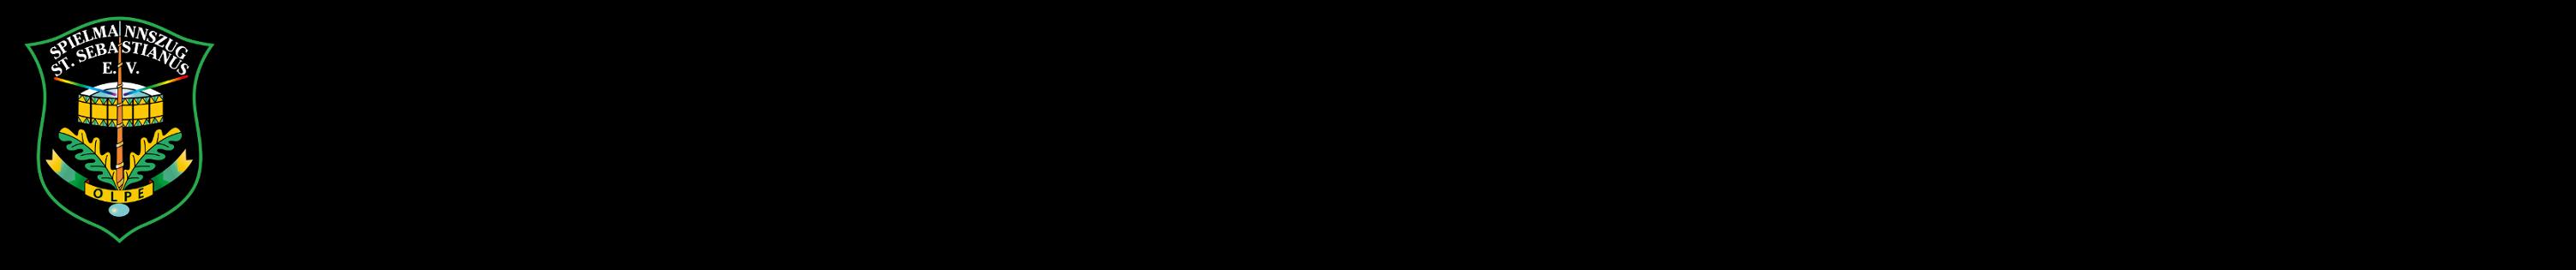 Spielmannszug Olpe